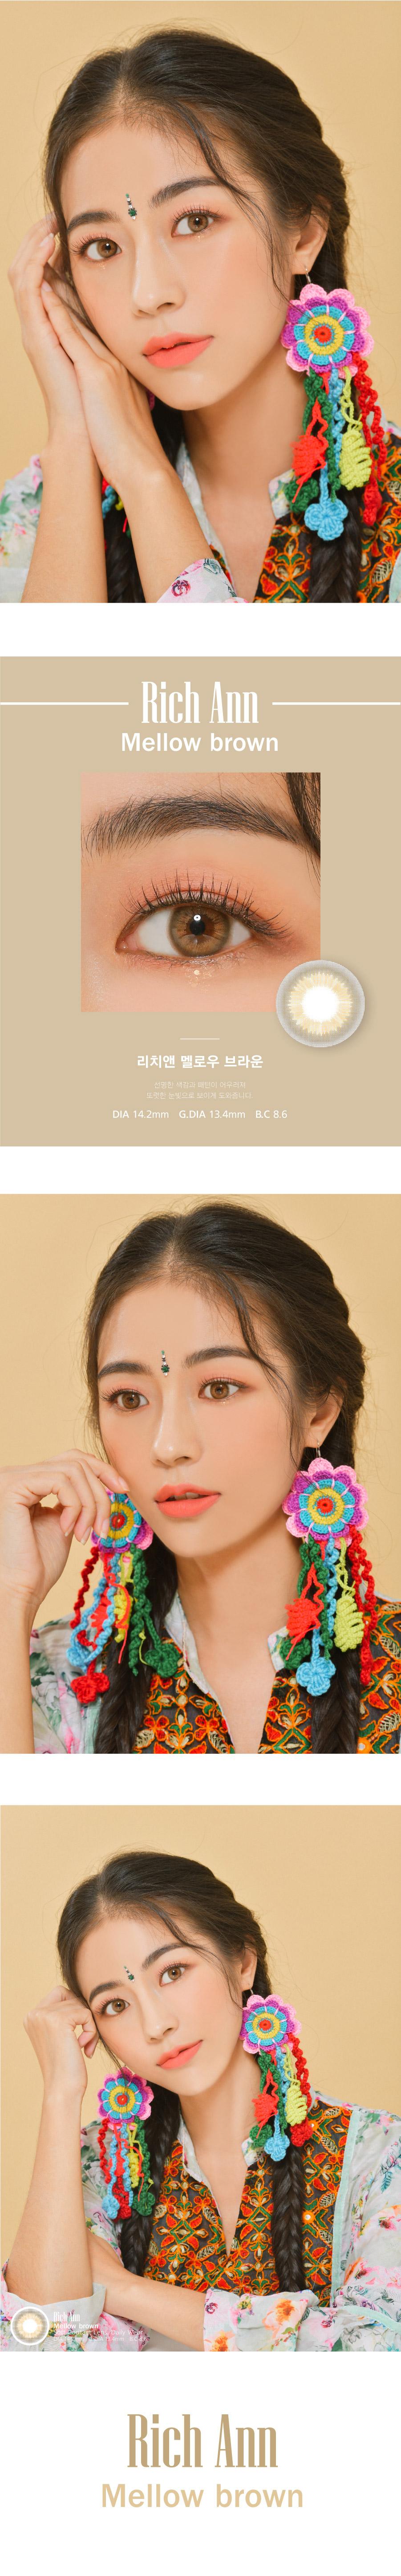 buy-ann365-mellow-brown-circle-lenses-klenspop-7.jpg